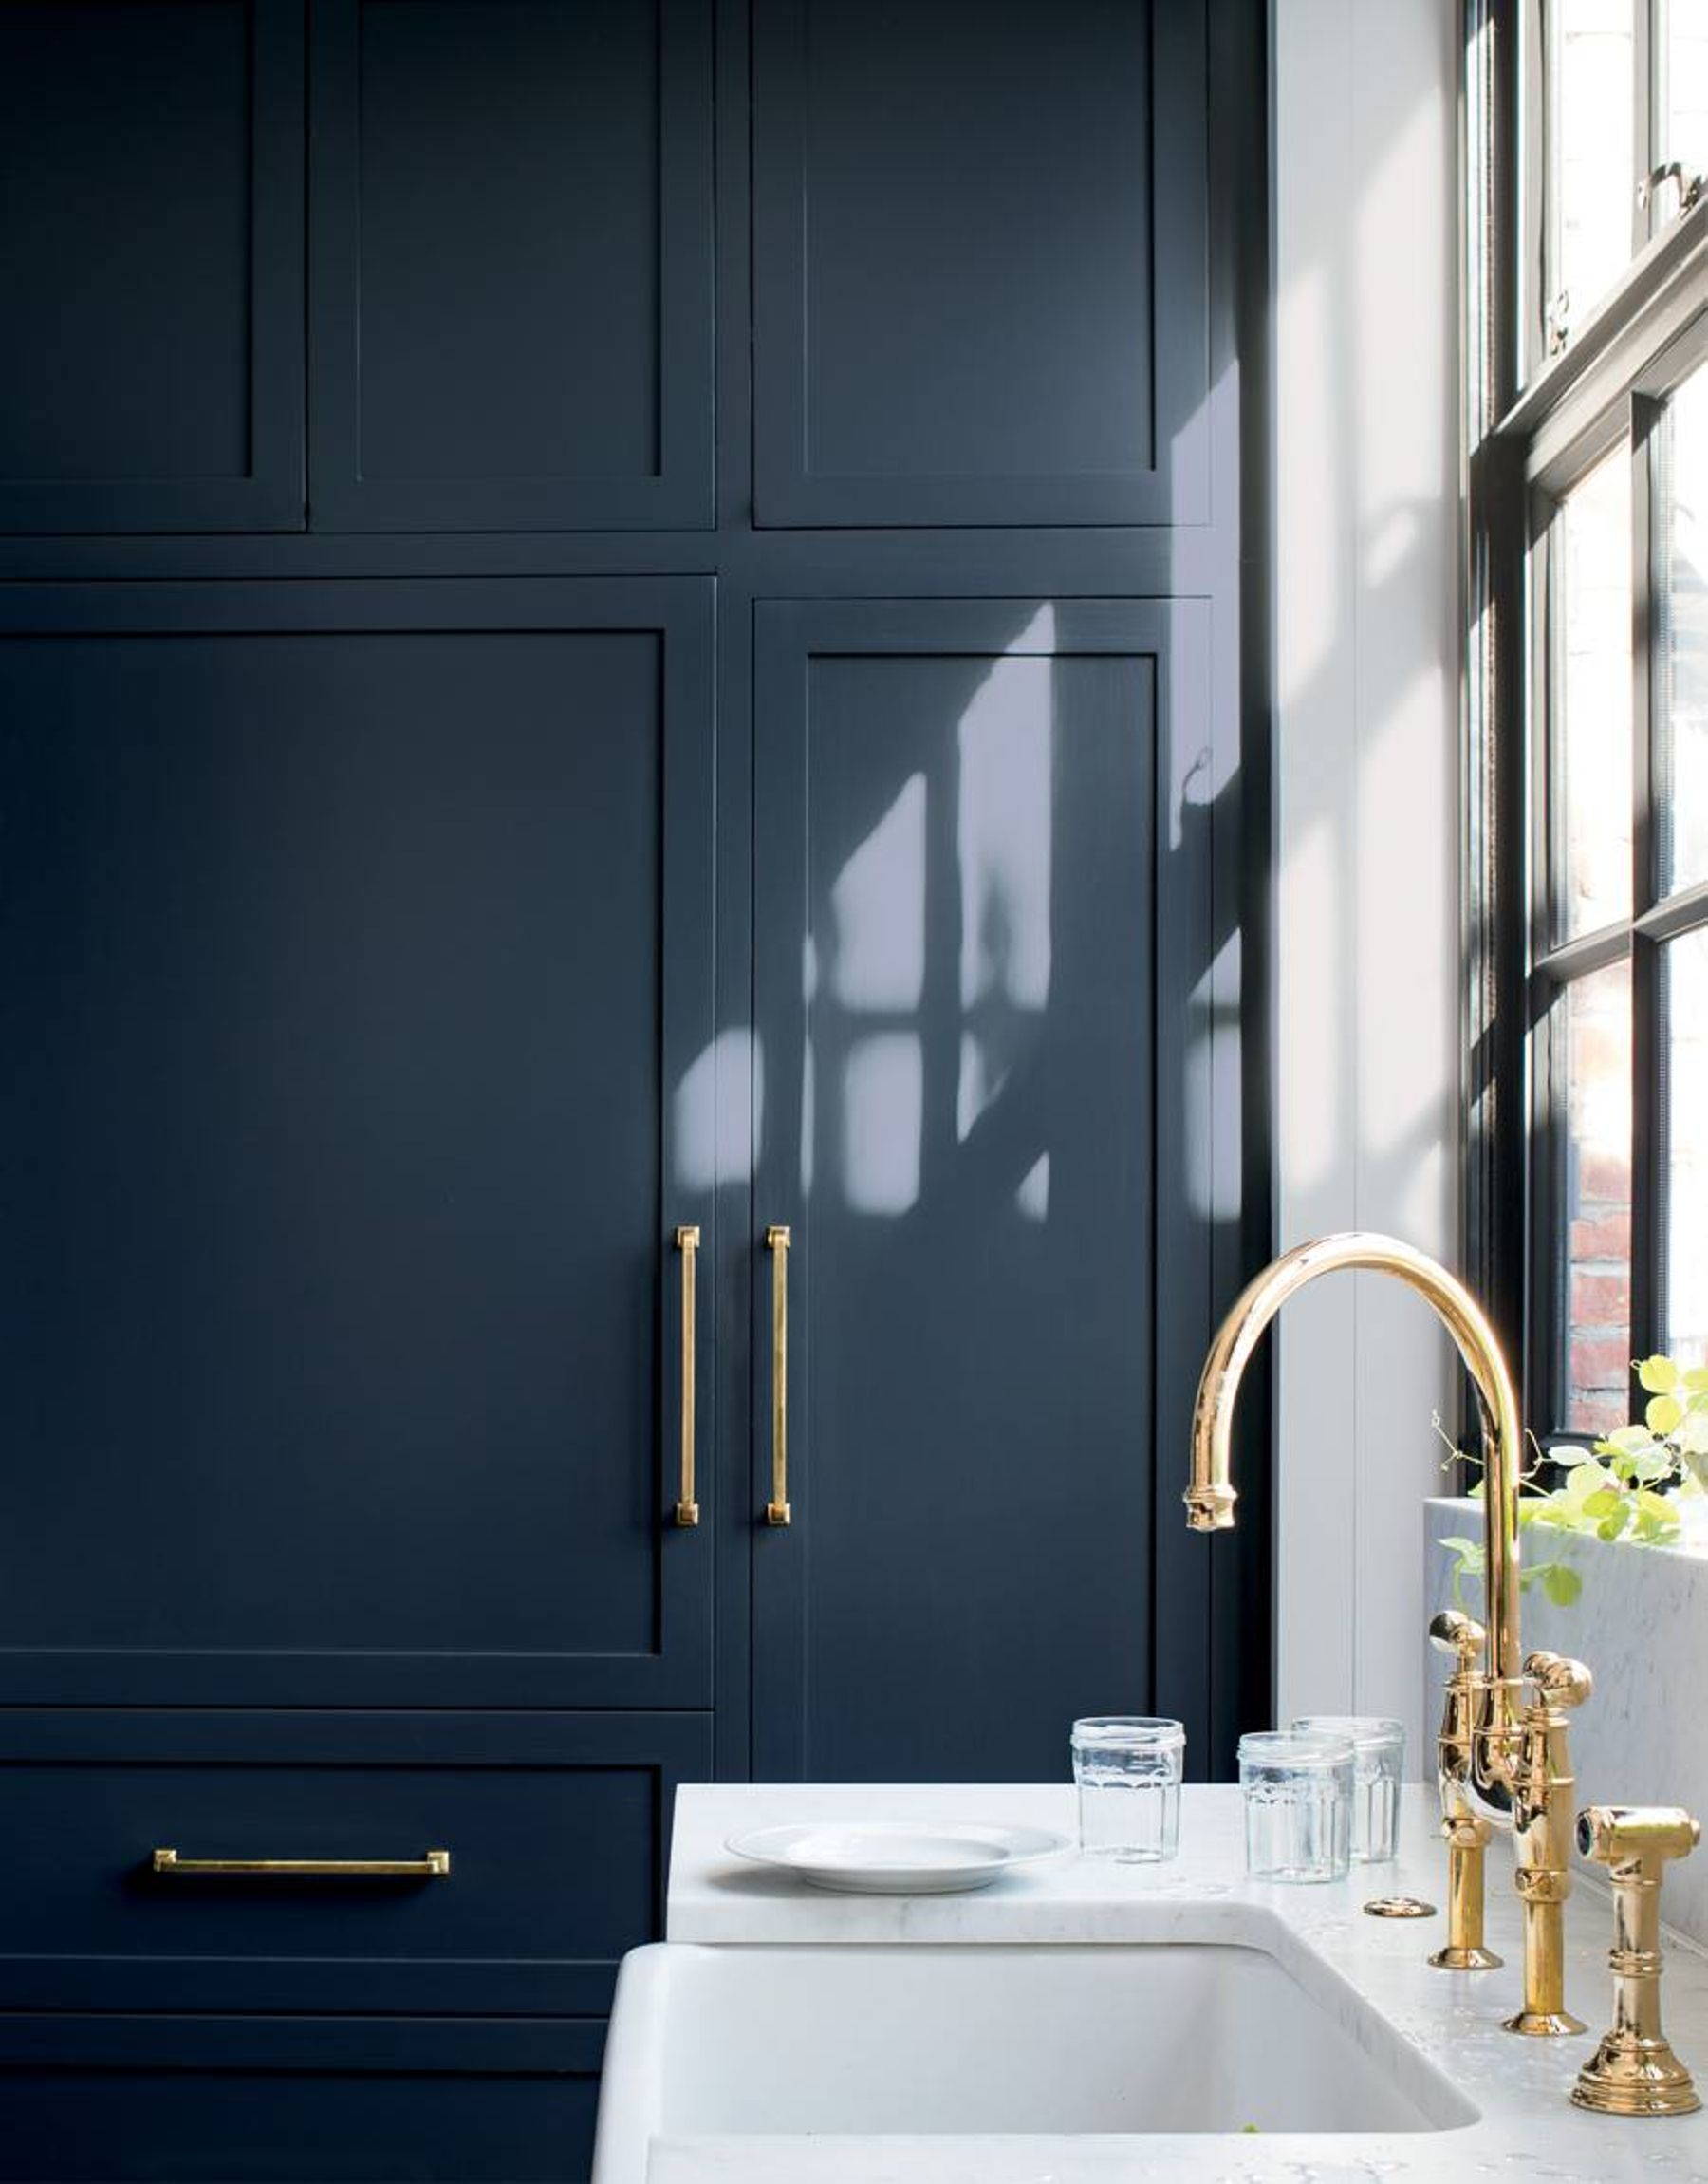 Bleu Marine Inspirations La Piece Kitchen Cabinet Colors Blue Kitchen Cabinets Navy Kitchen